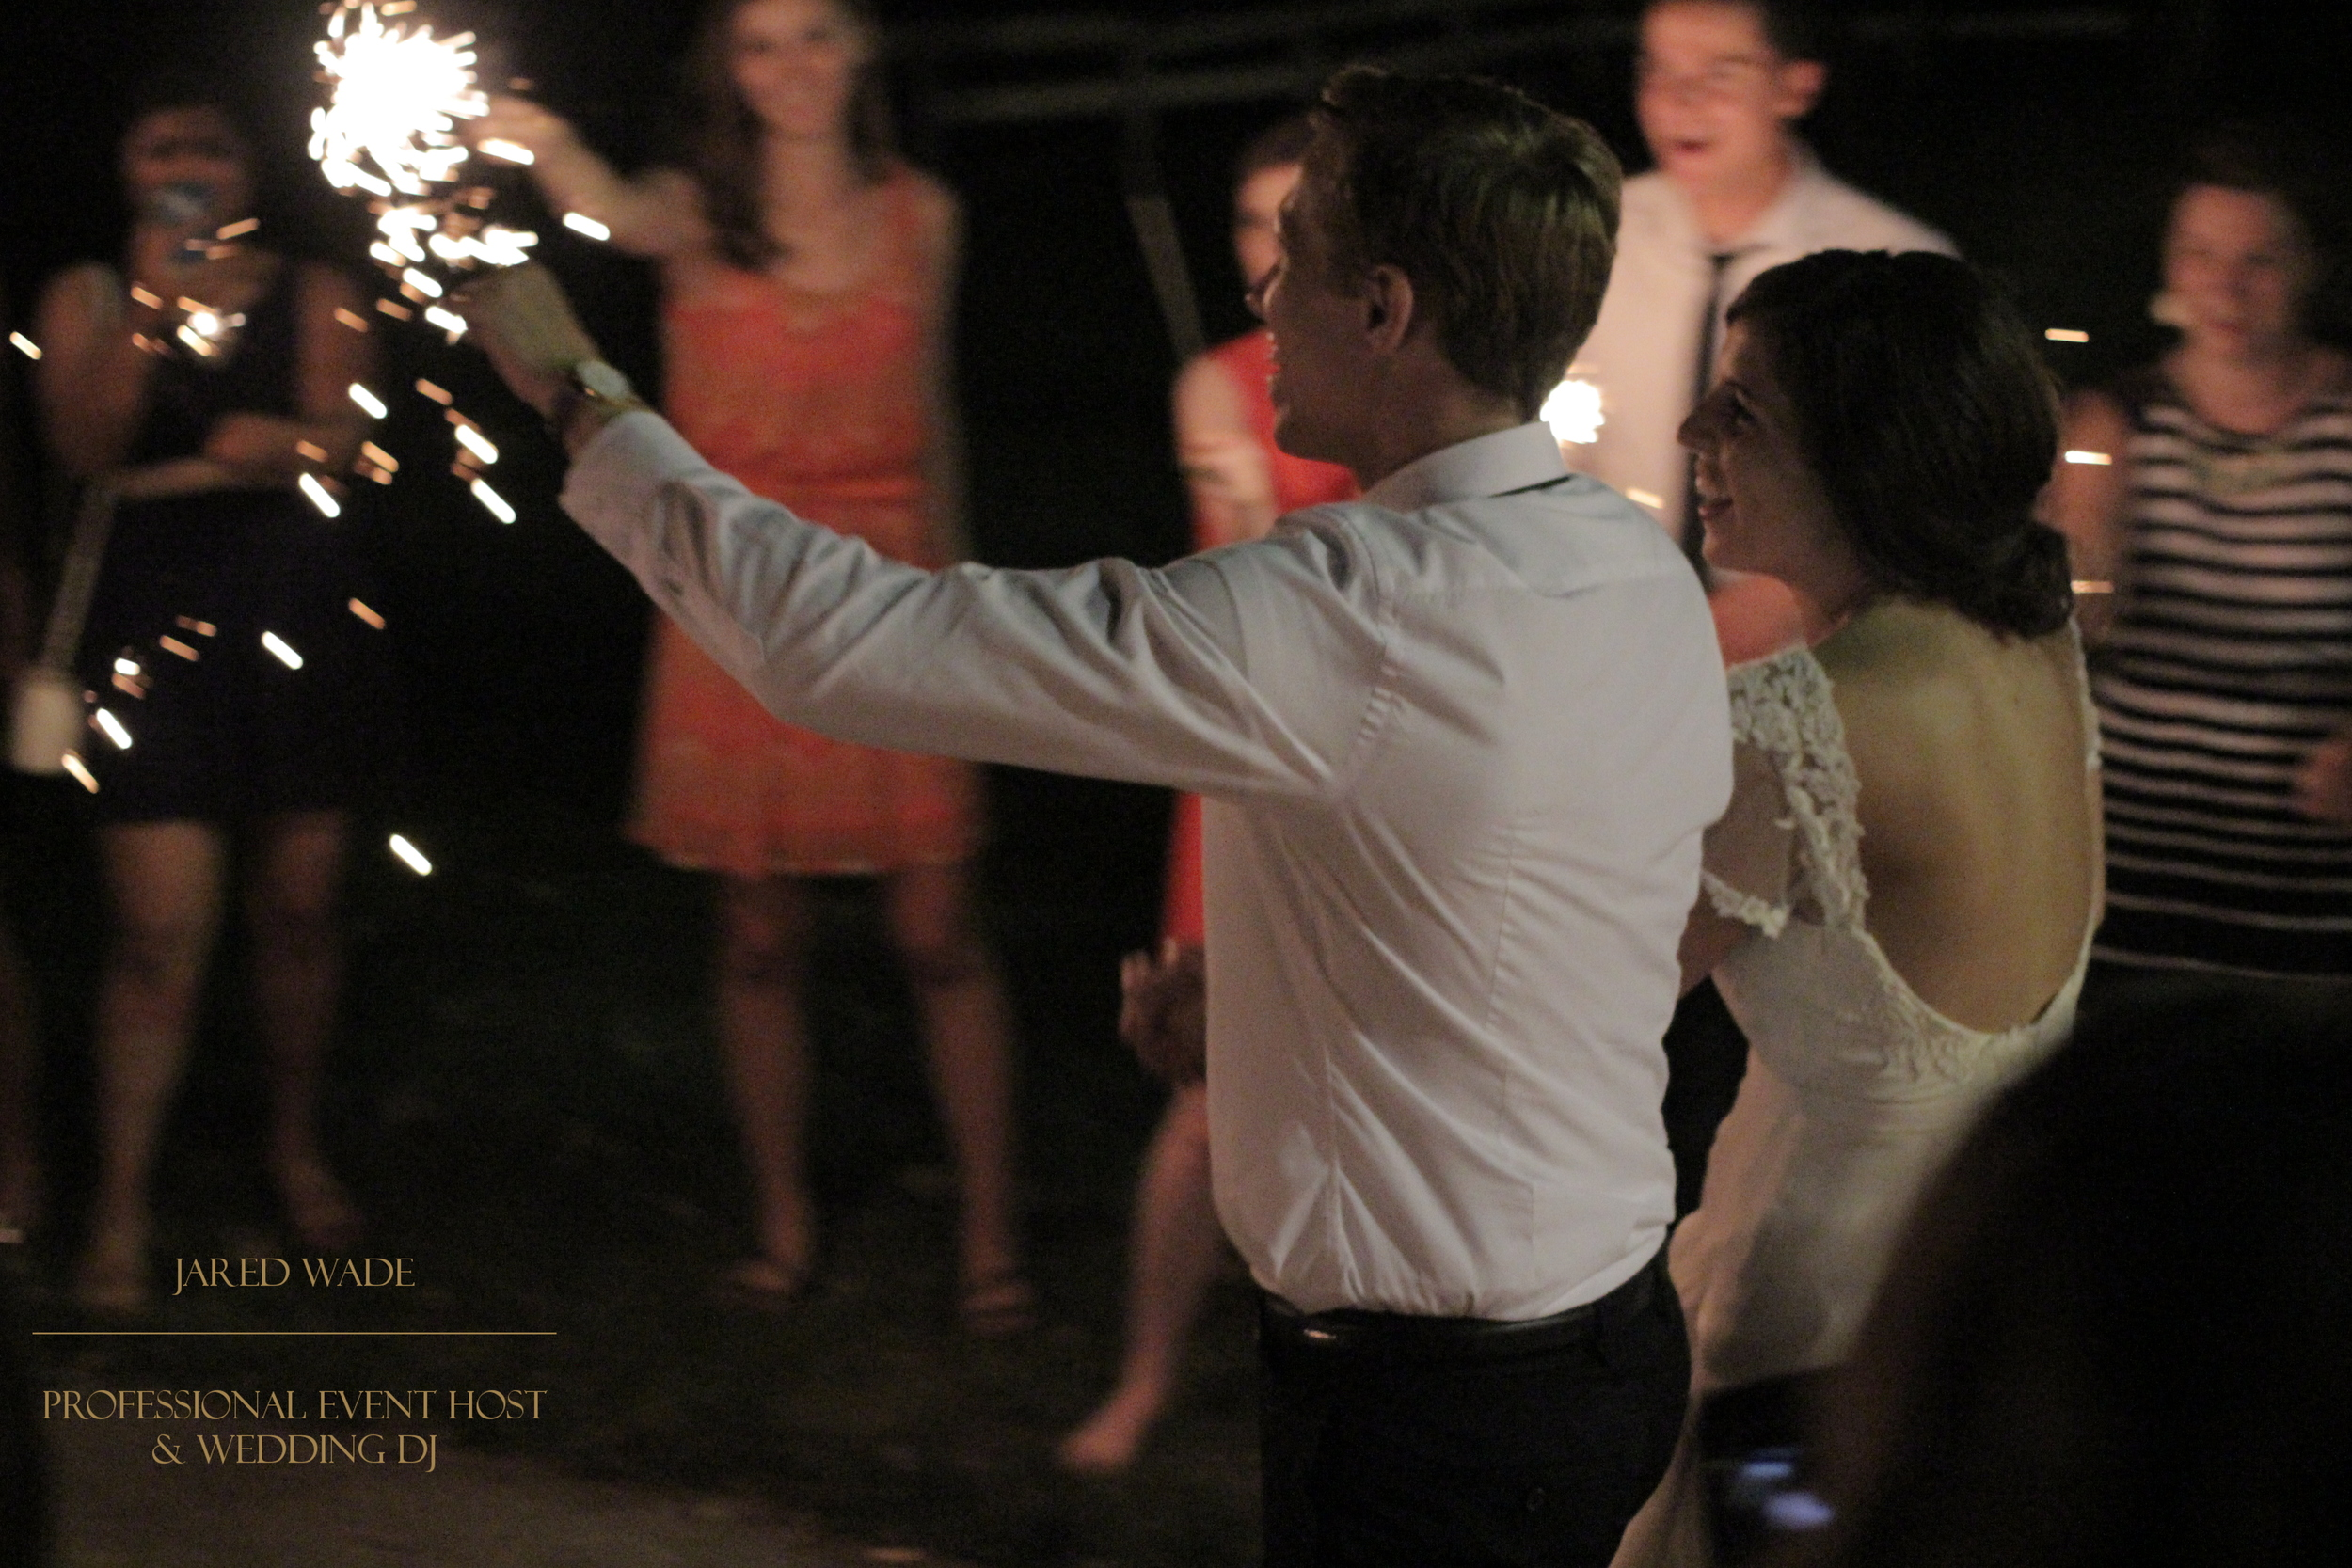 Jared Wade Professional Event Host | Indianapolis Wedding DJ | Morgan Acres Venue | Barn Wedding | Big Dance | Indianapolis Indiana